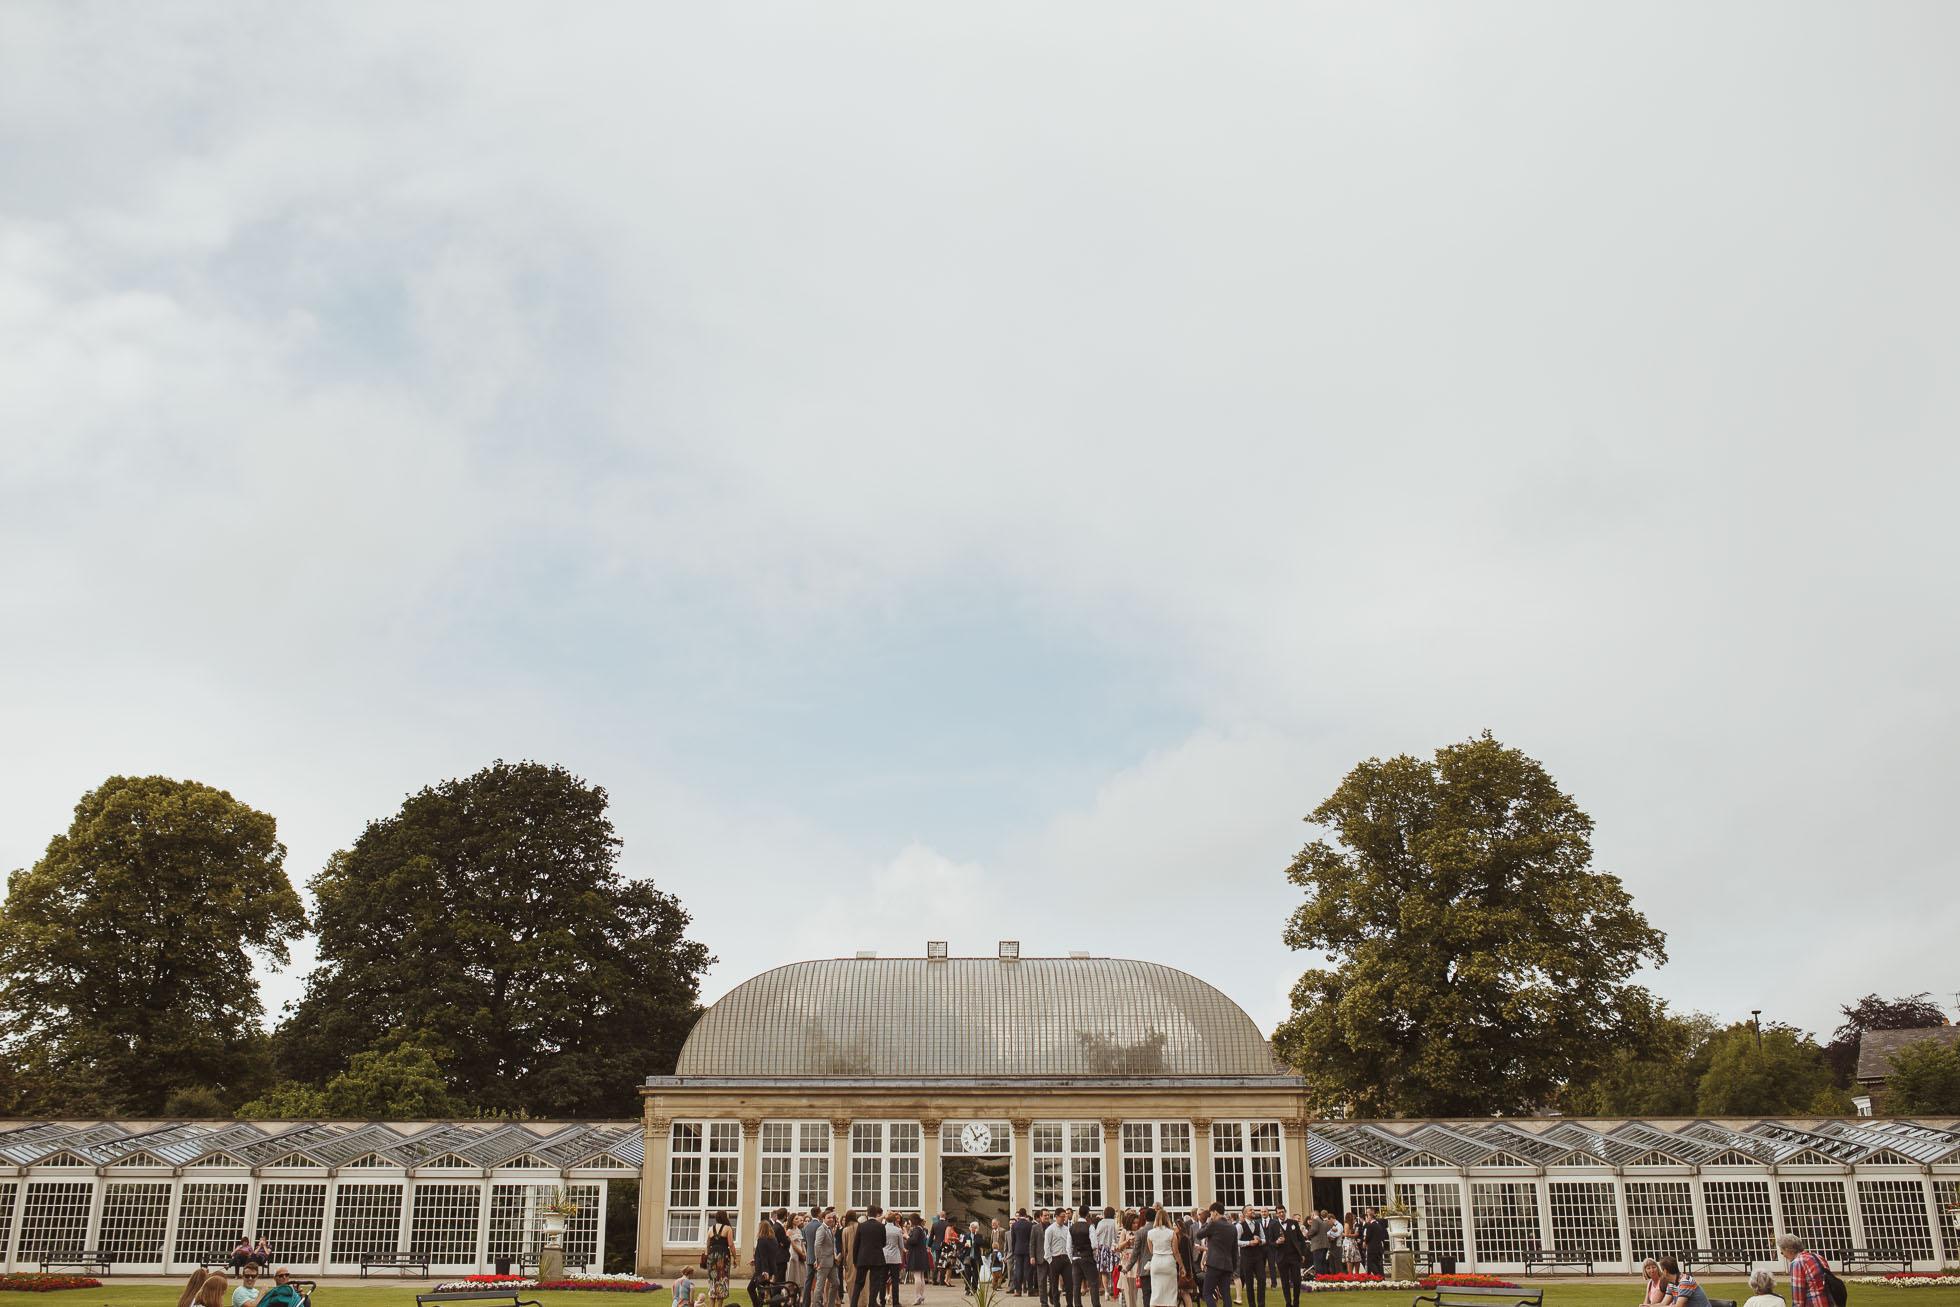 sheffield-botanical-gardens-wedding-photographer-19.jpg